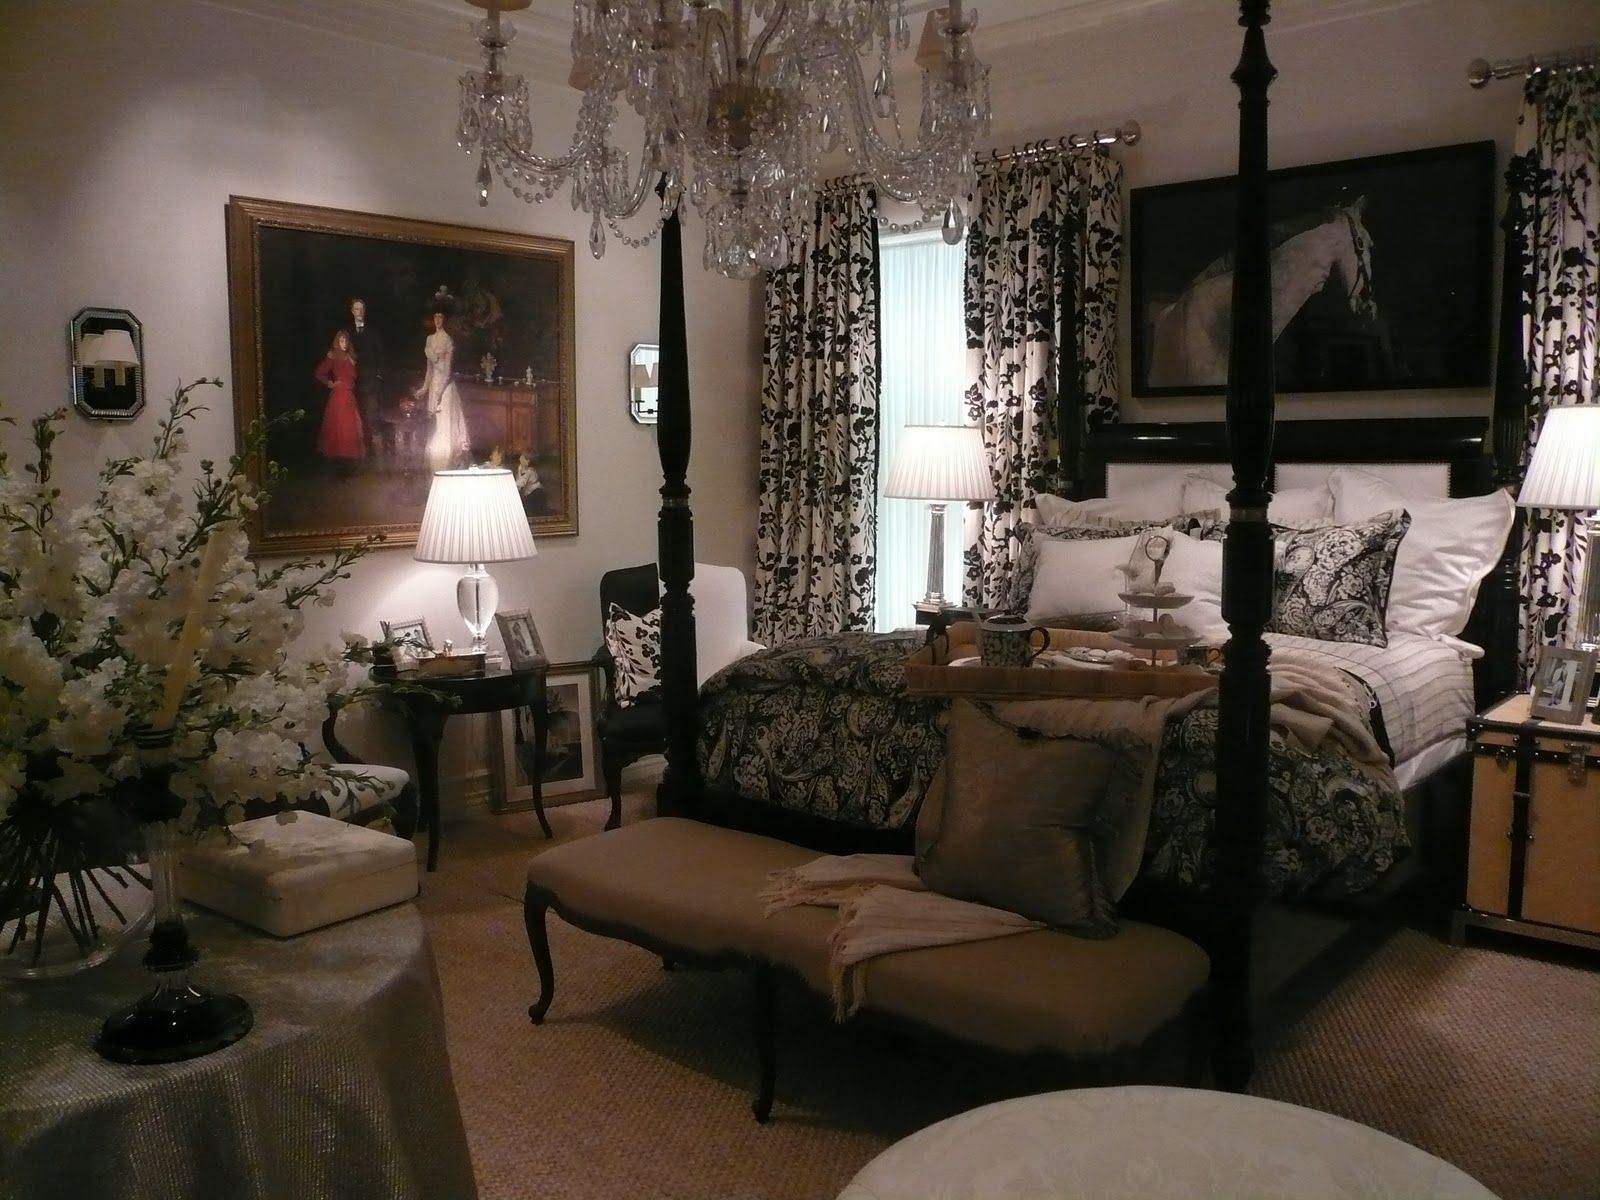 enchanting bedroom decorating inspiration photos | Enchanting Ralph Lauren Bedrooms Images Pictures ...